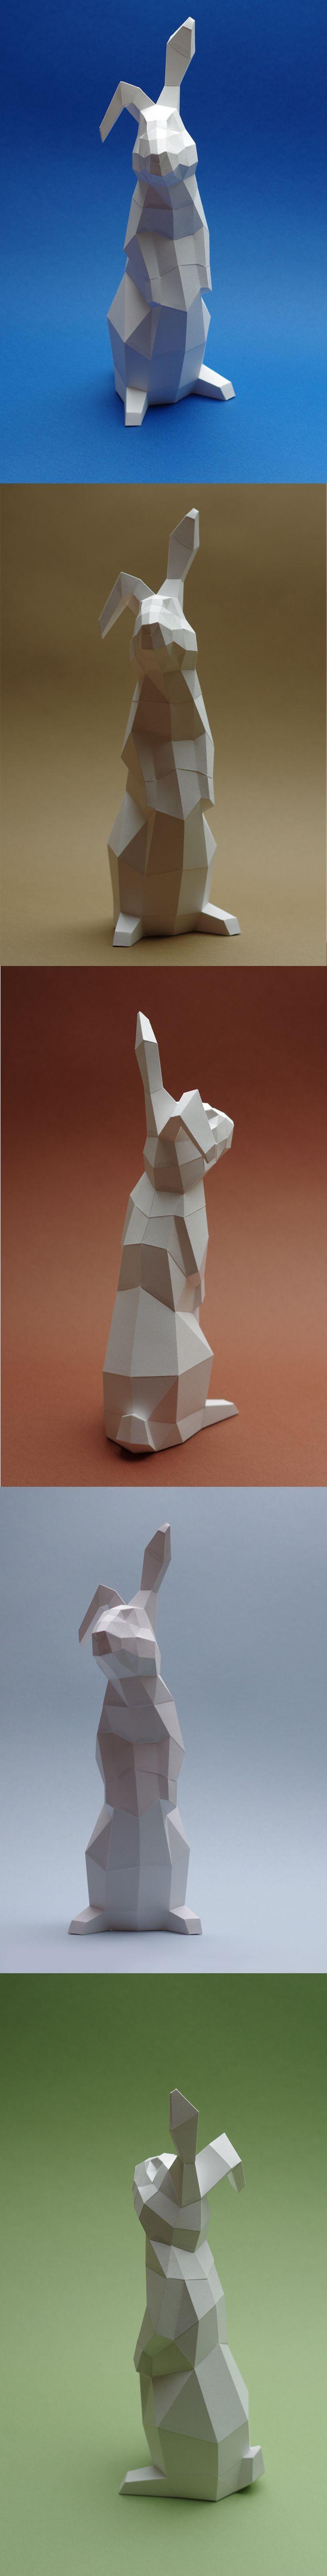 Paperwolf Rabbit.